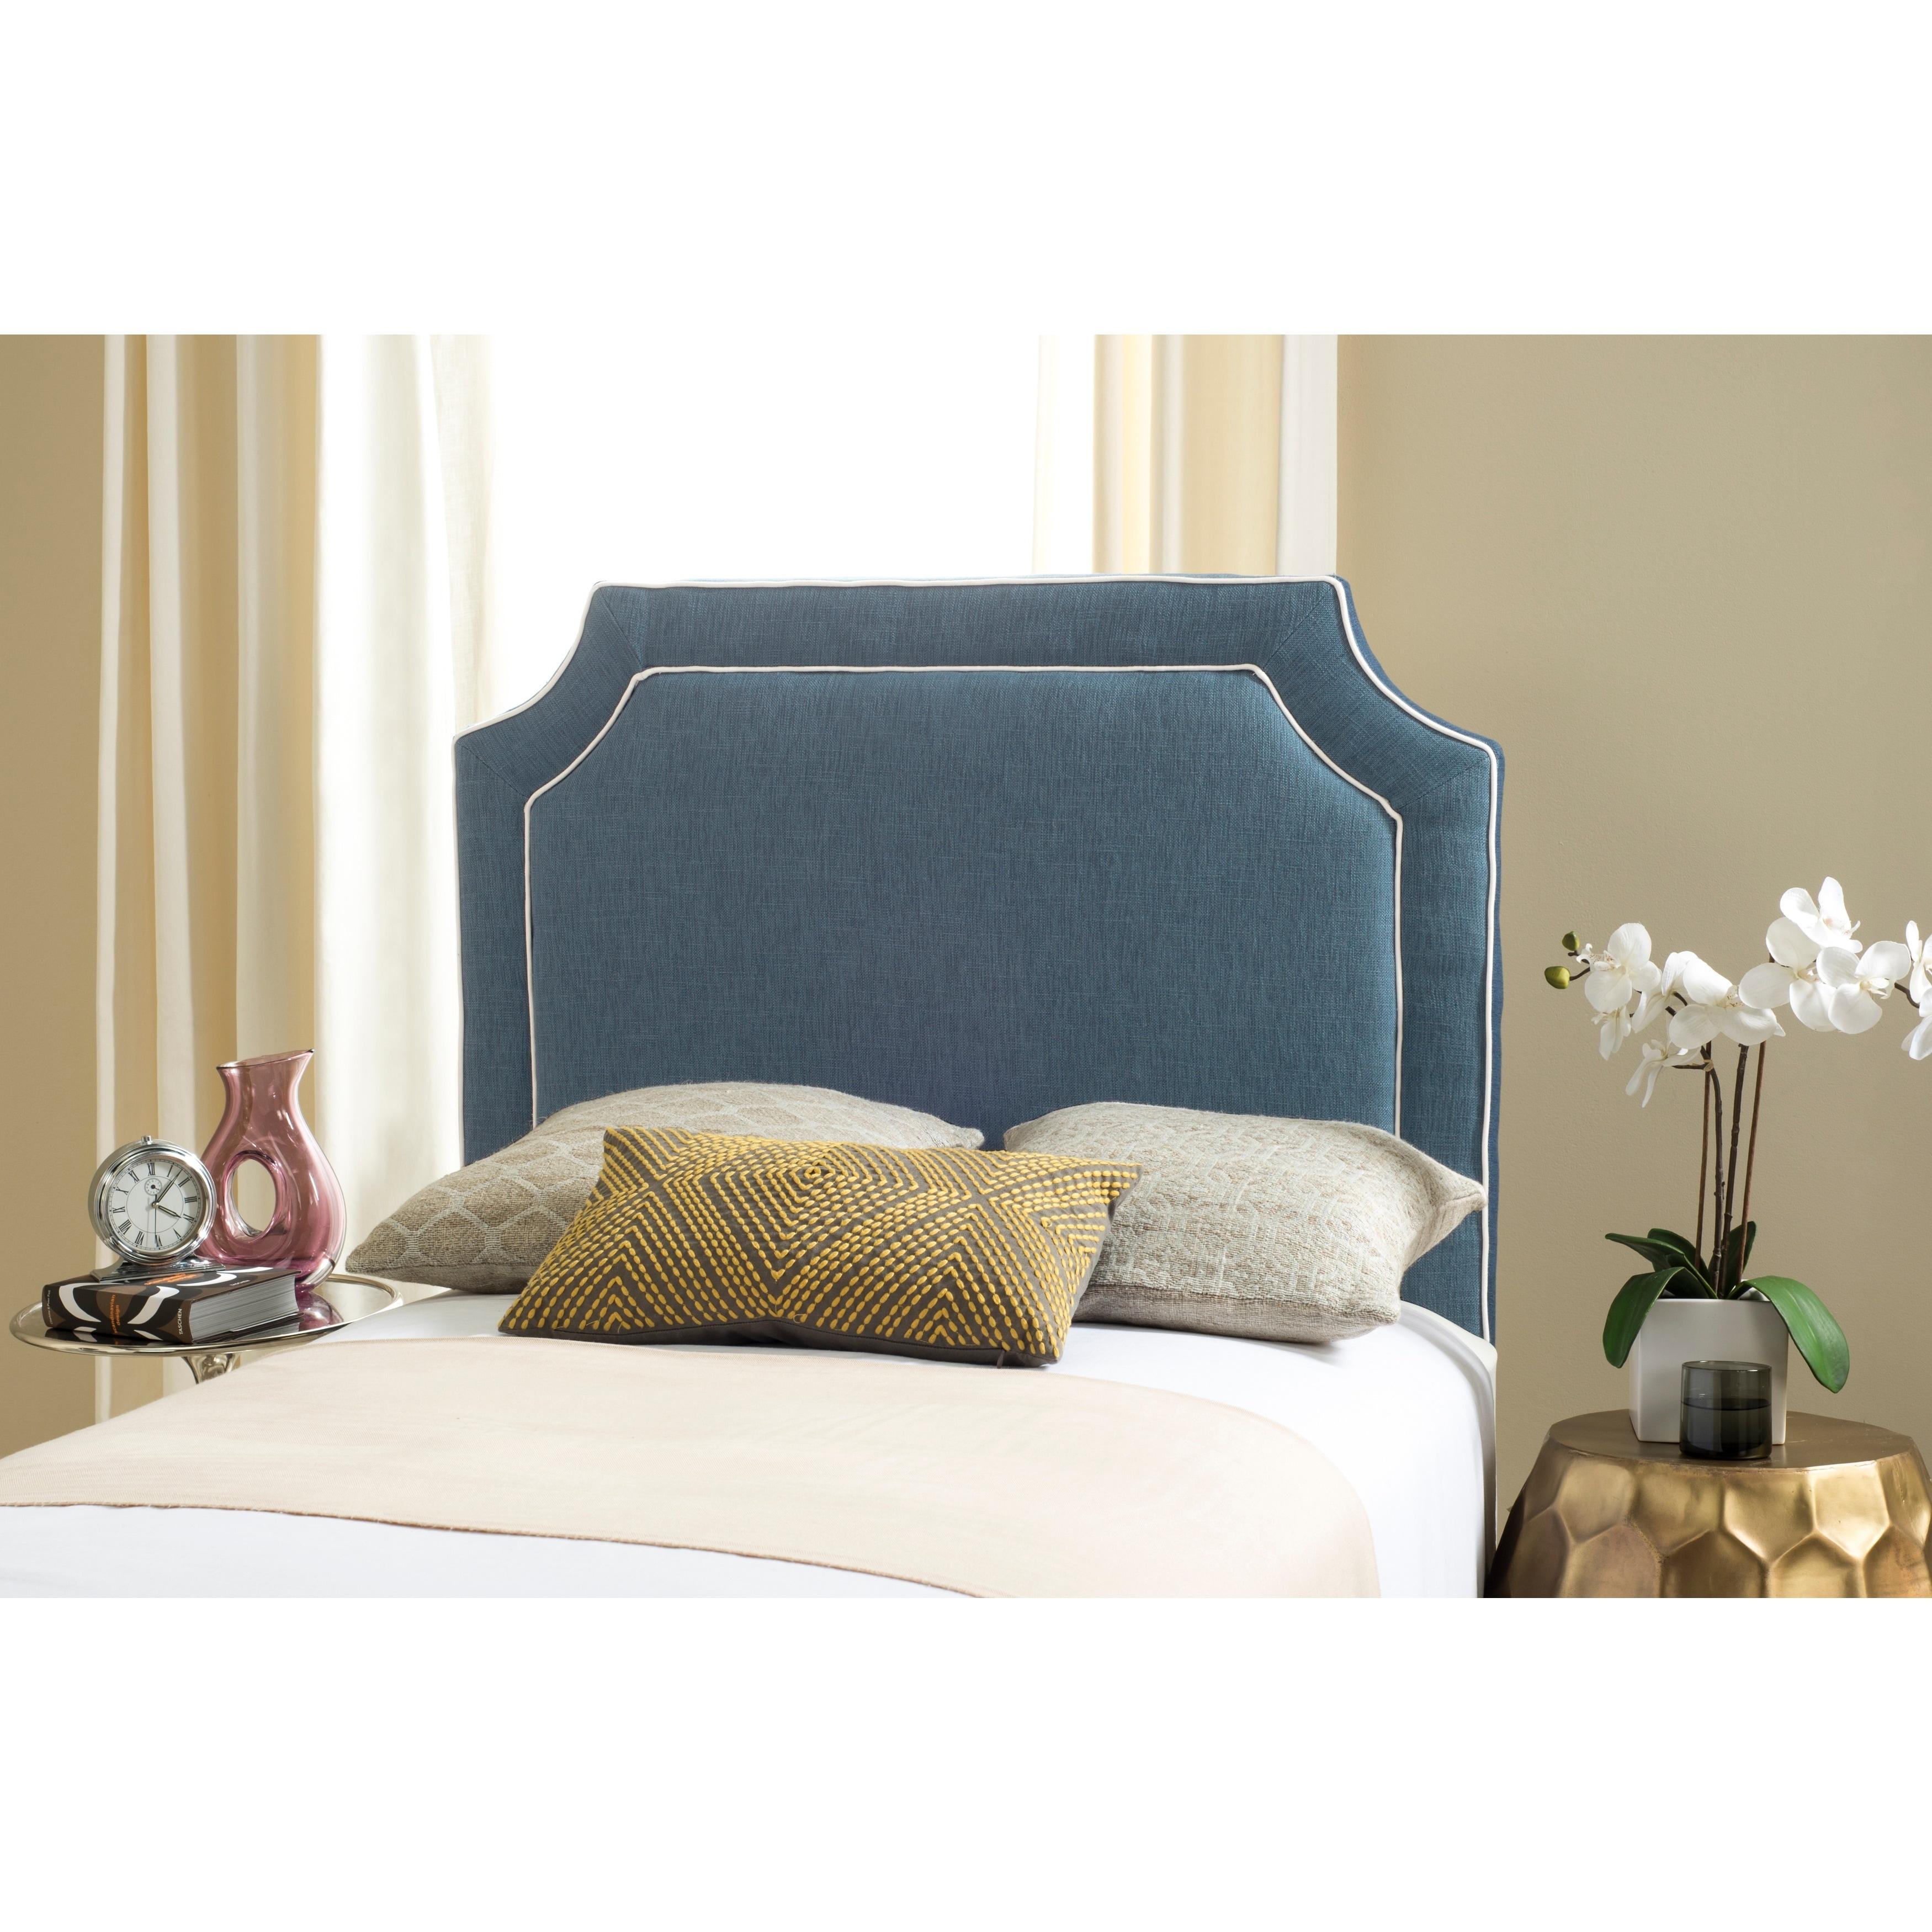 Safavieh Dane Denim Blue White Piping Upholstered Headboard Twin